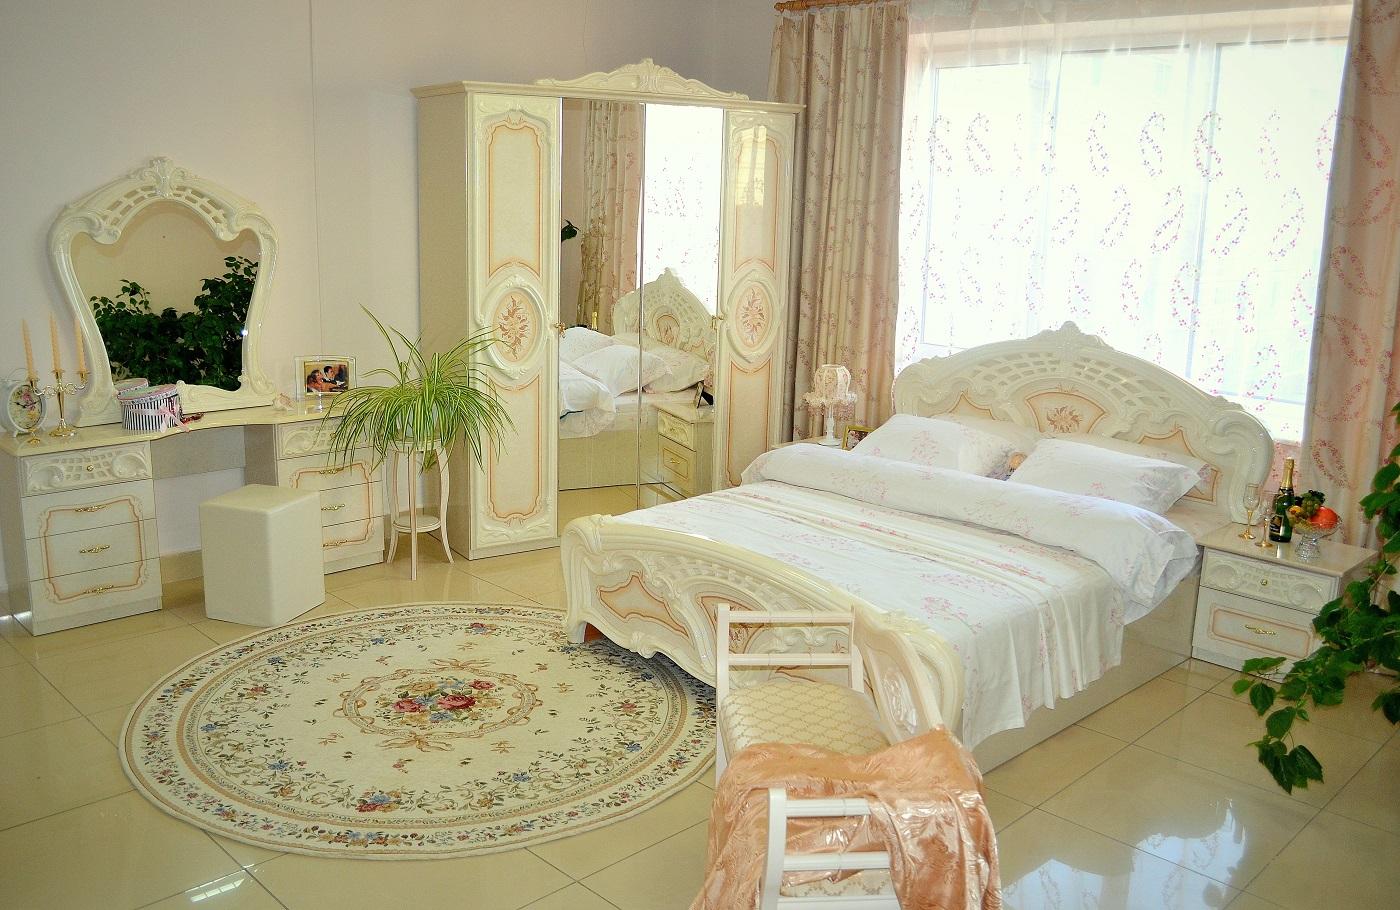 sehr sch ne schminkkommode schminktisch. Black Bedroom Furniture Sets. Home Design Ideas